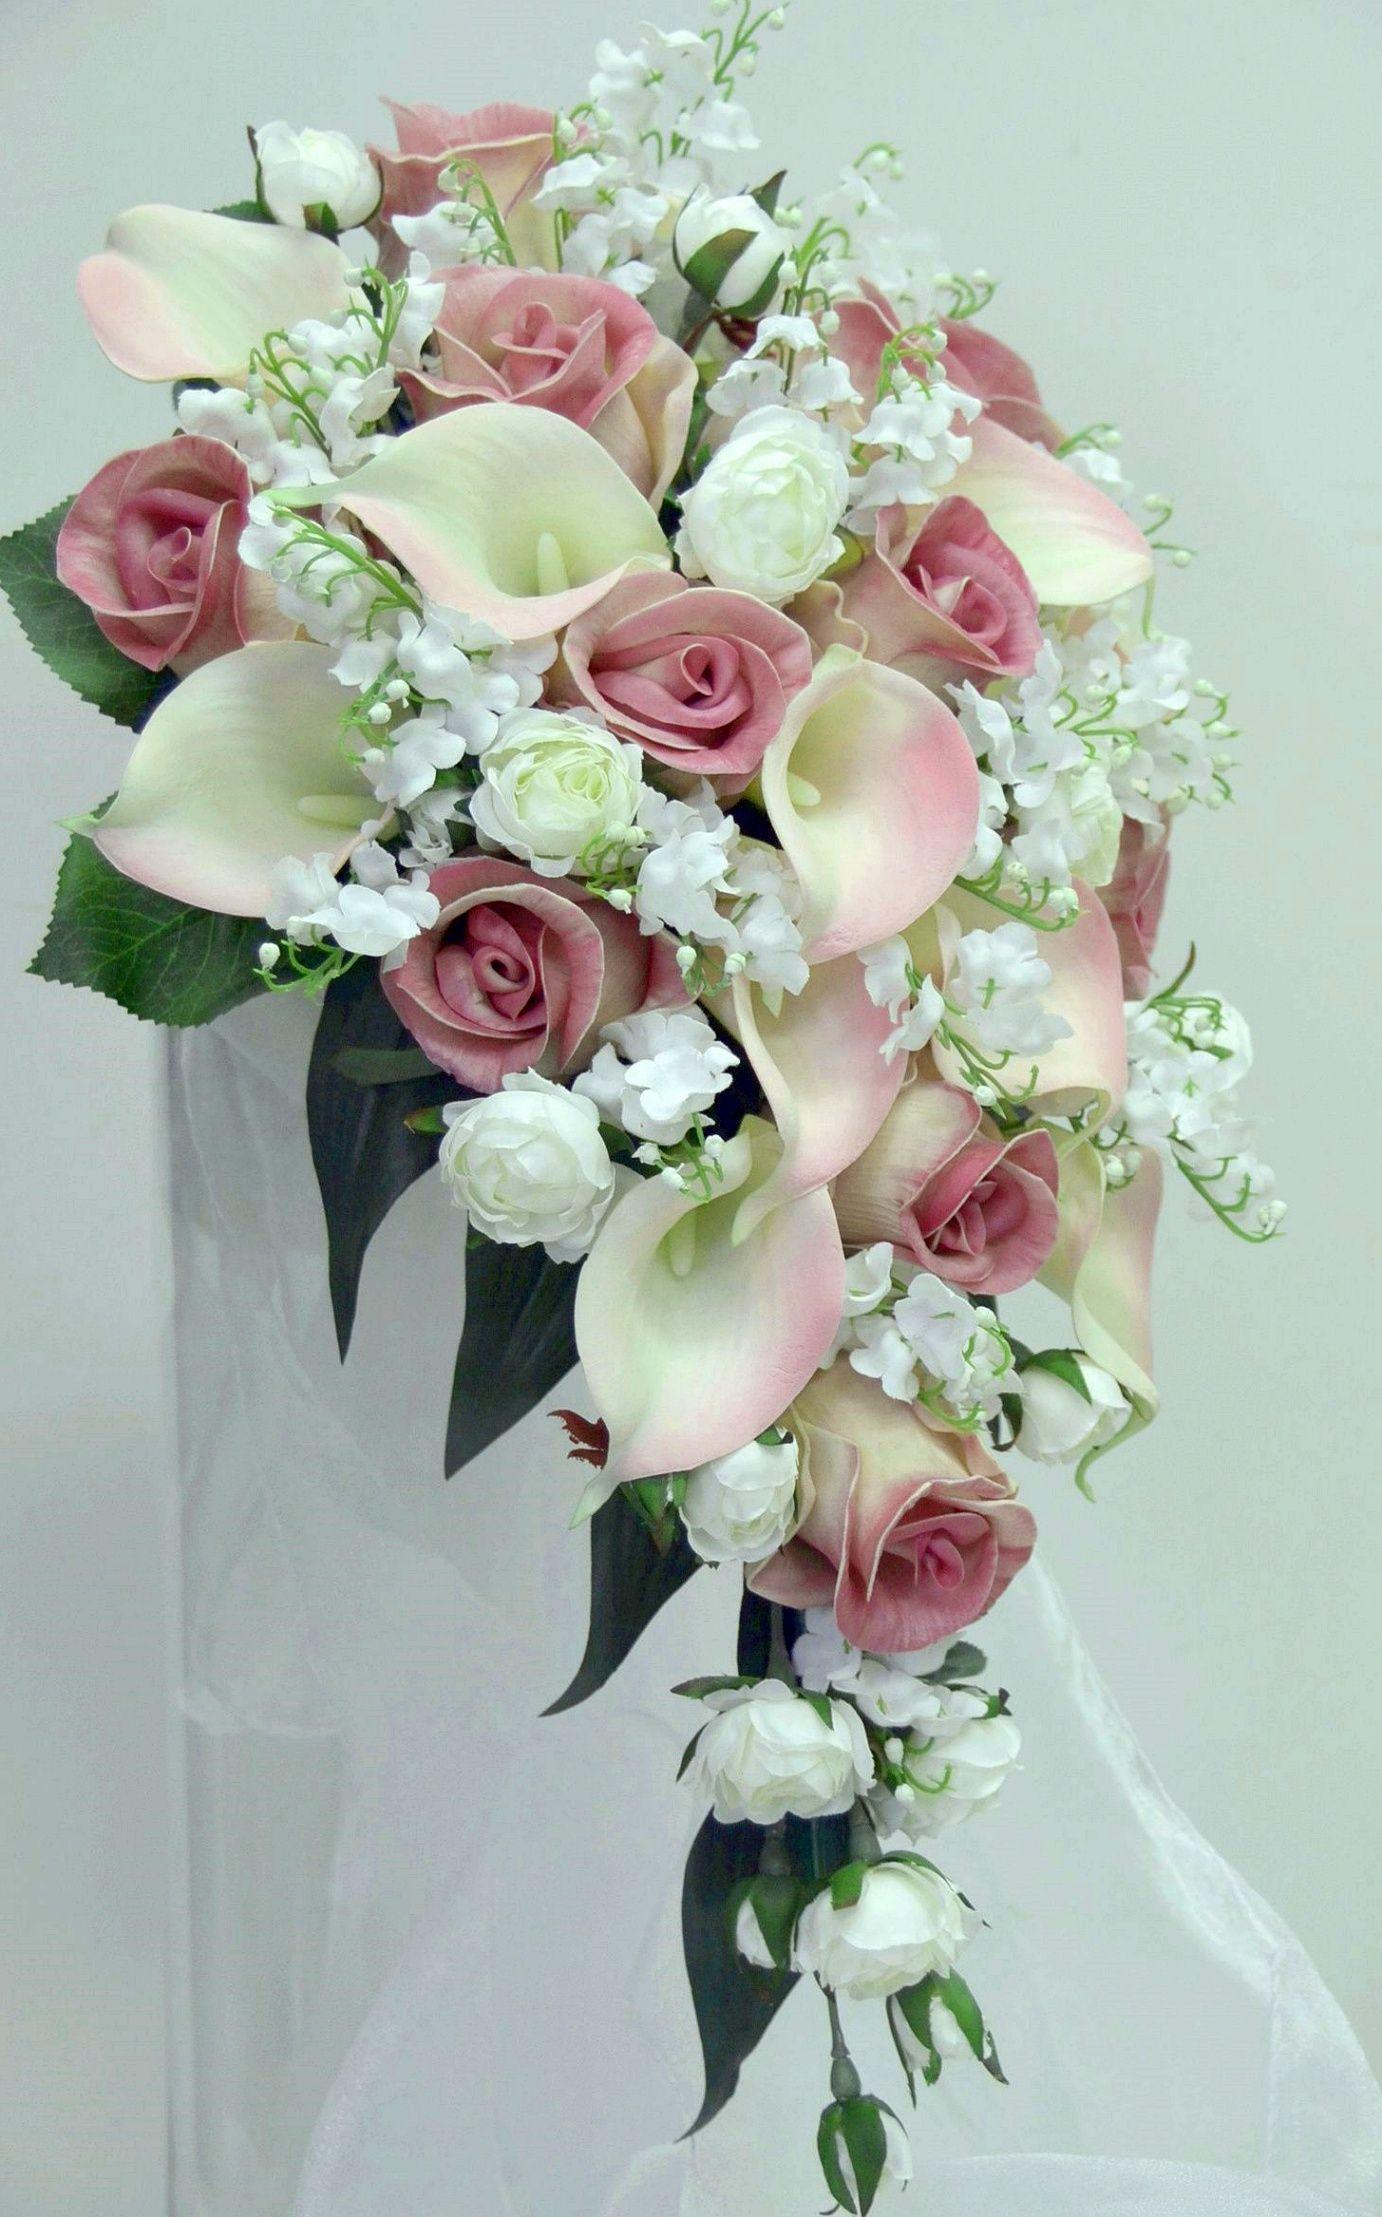 FreshFlower Arrangements for Wedding (With images) Rose